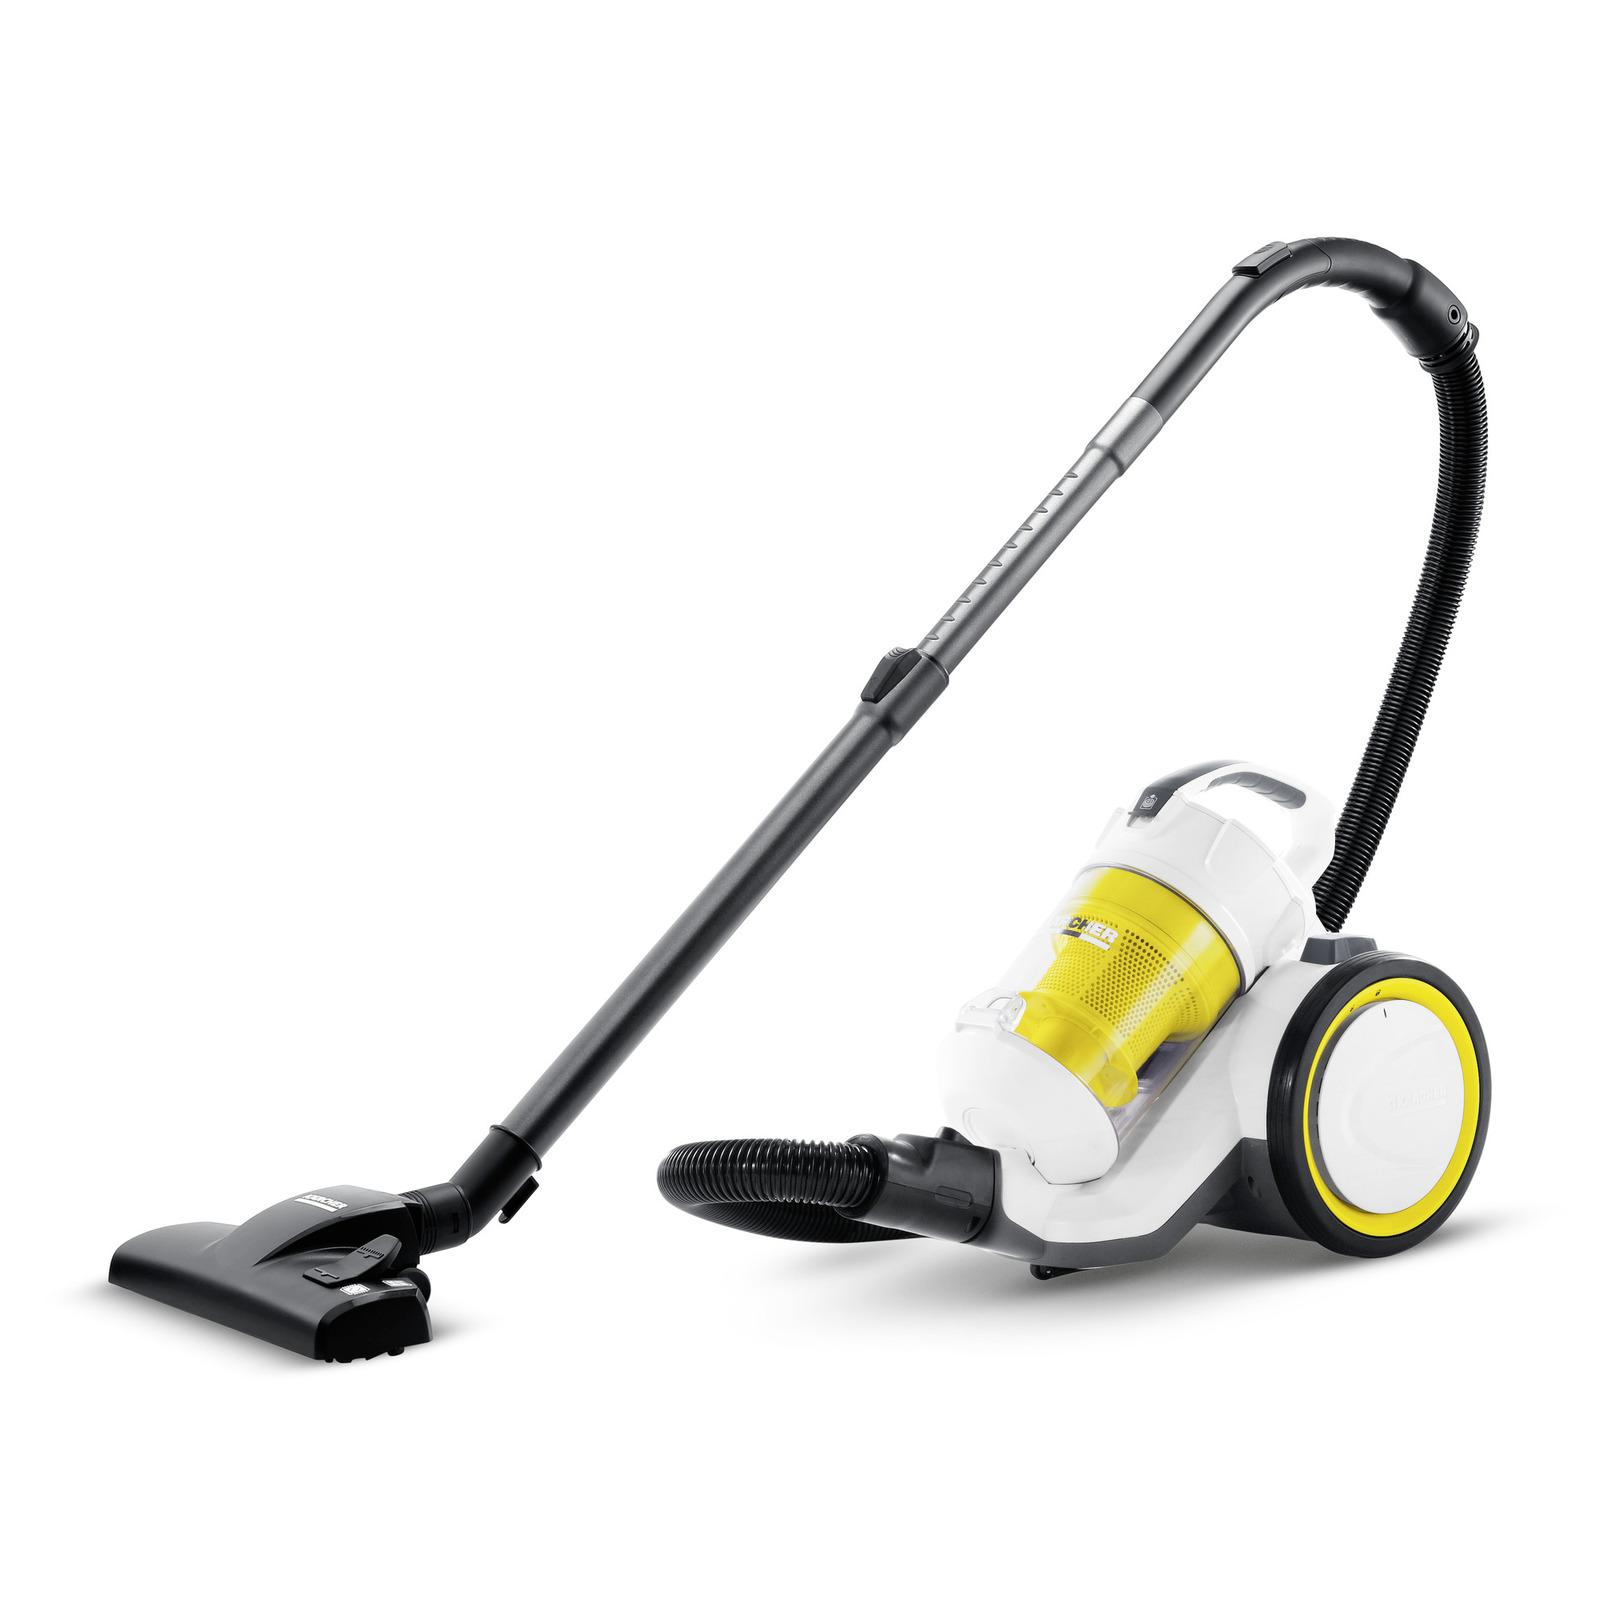 vacuum cleaner vc 3 premium 1100w sea k rcher. Black Bedroom Furniture Sets. Home Design Ideas